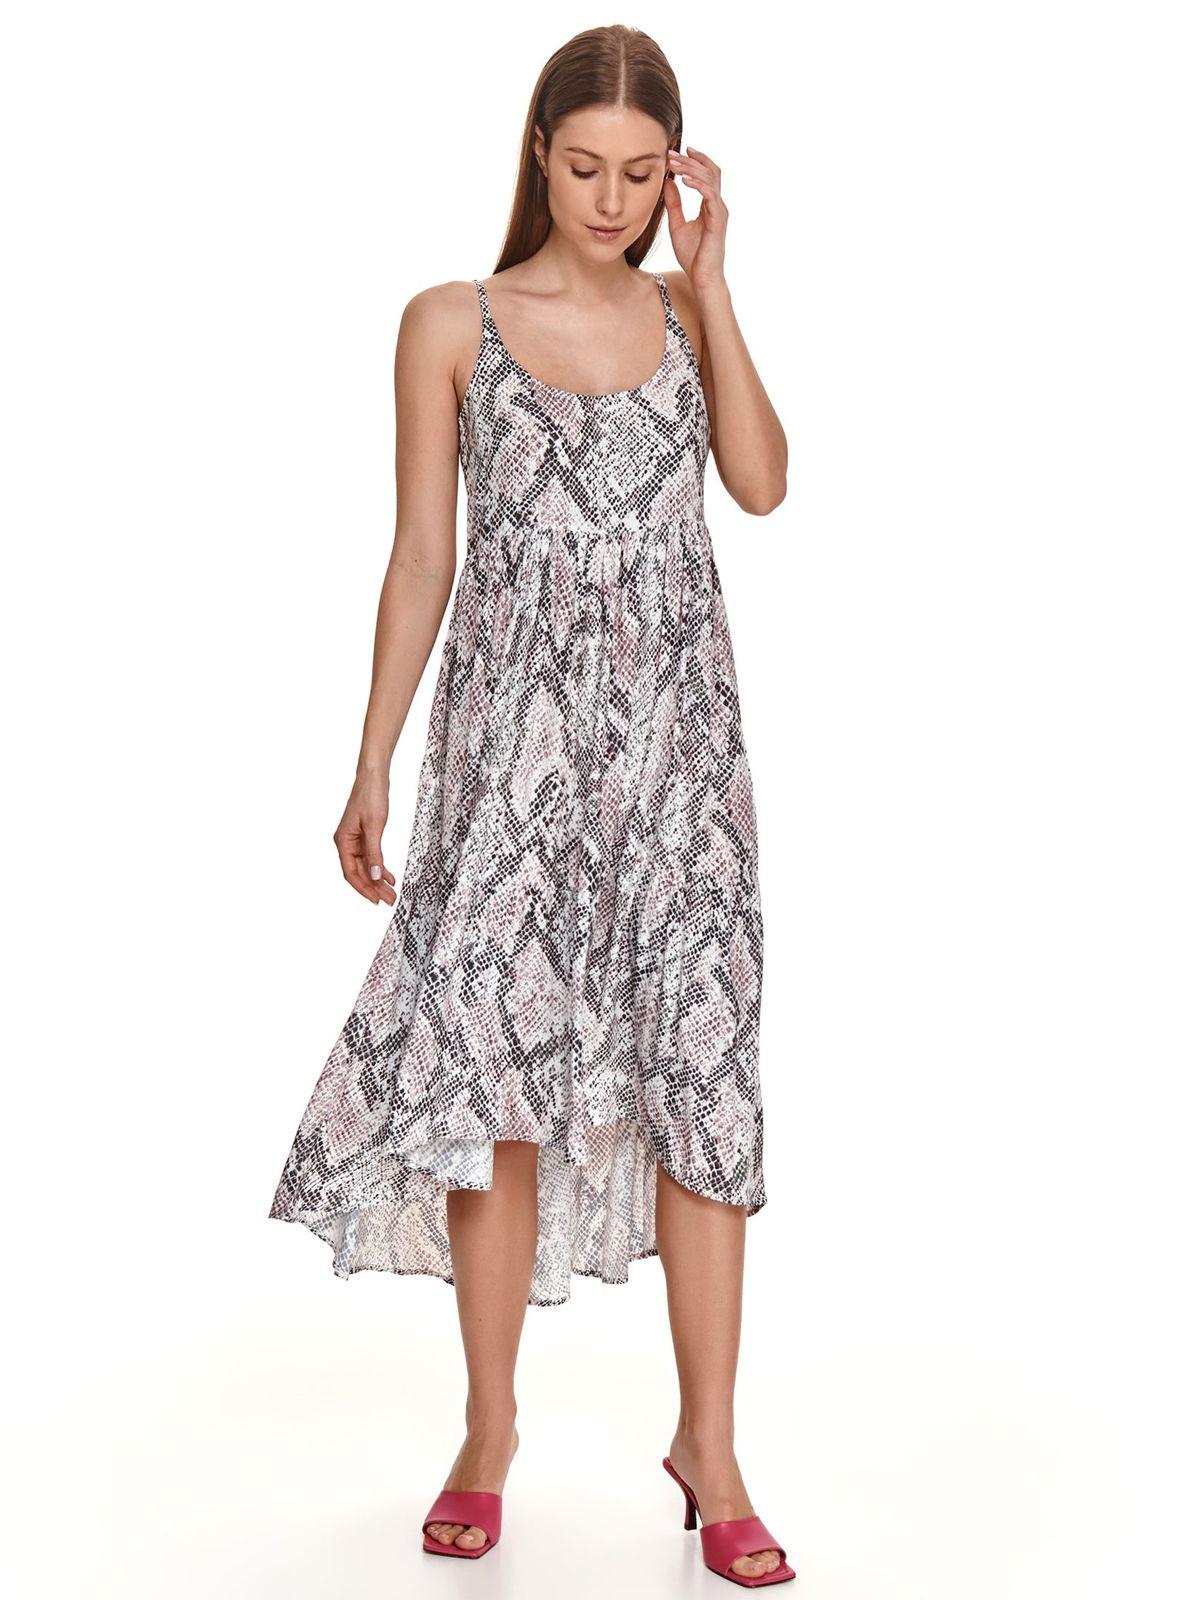 Peach dress animal print asymmetrical airy fabric